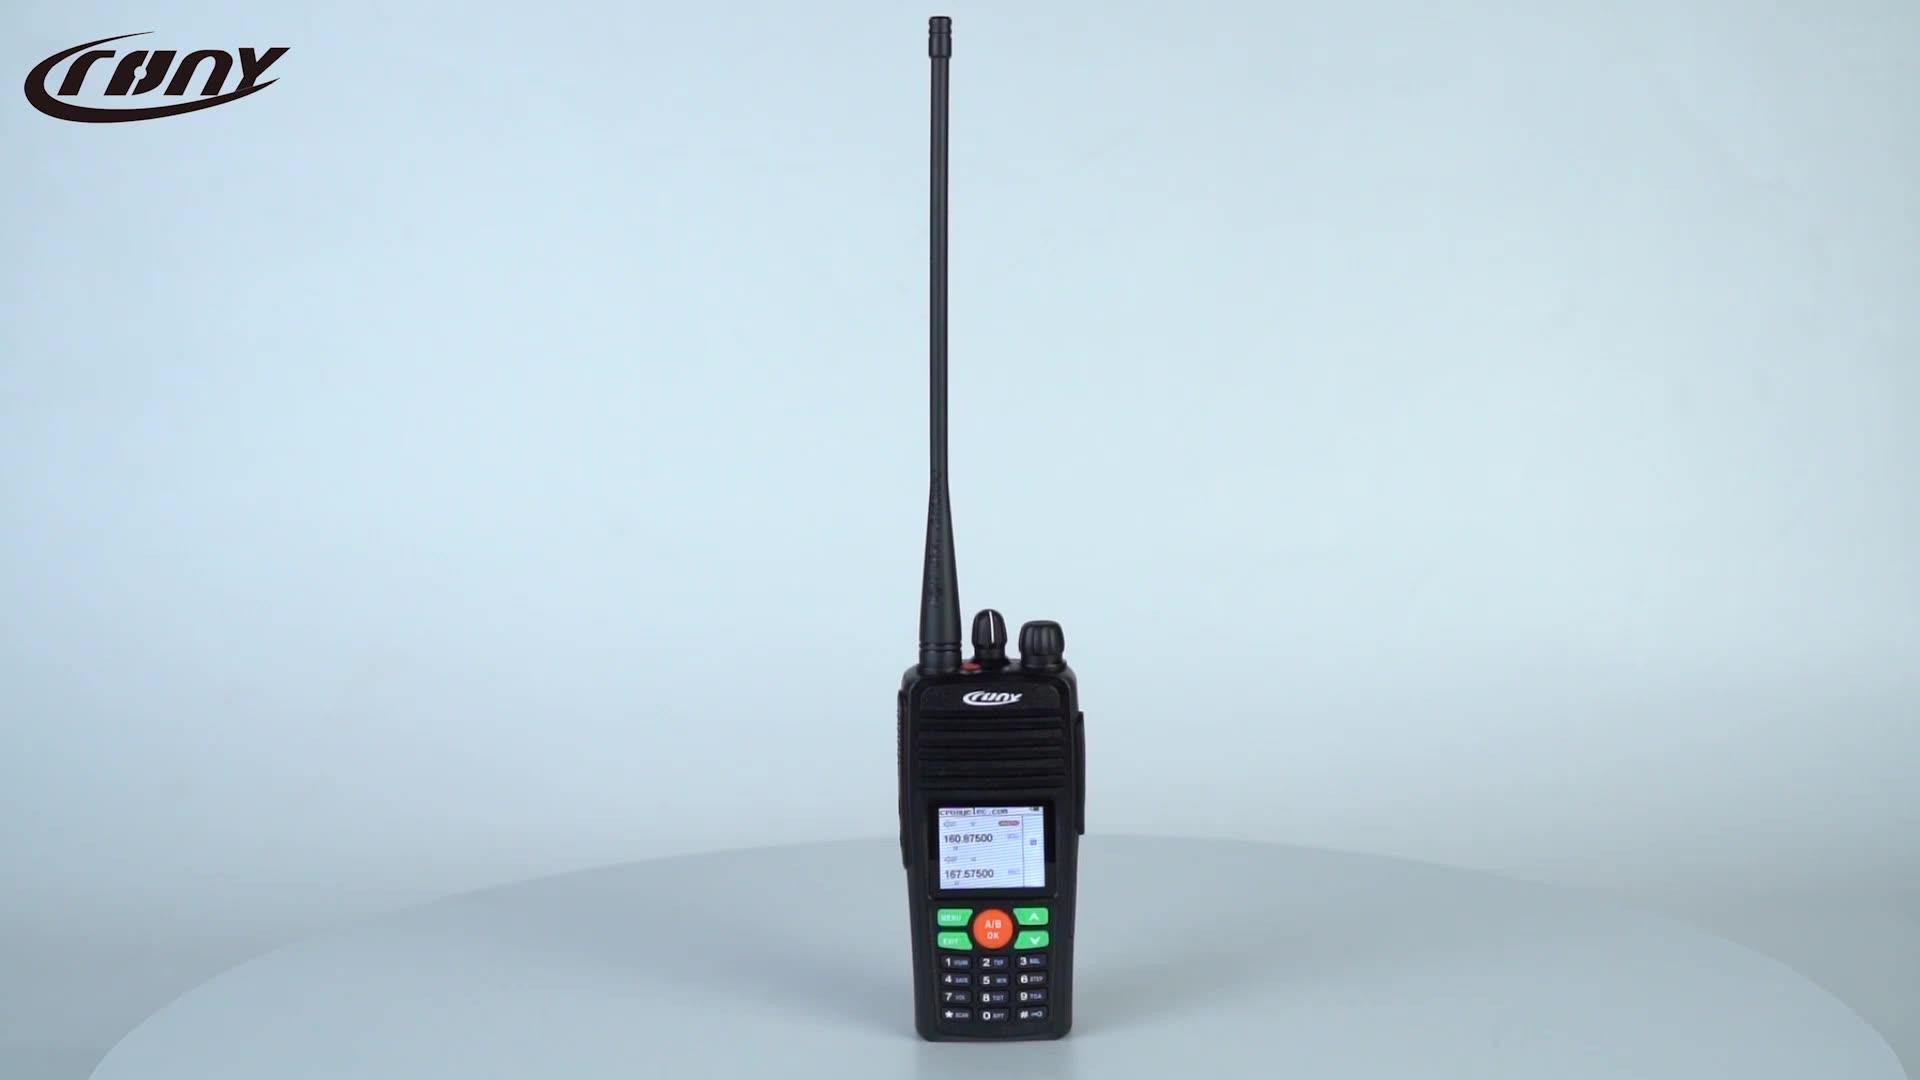 Handheld Calhar Dois Sentidos 15km 10Watt Grande display LCD de Rádio de Longo Alcance Transceptor VHF UHF Dual Band Walkie talkie DT-8188